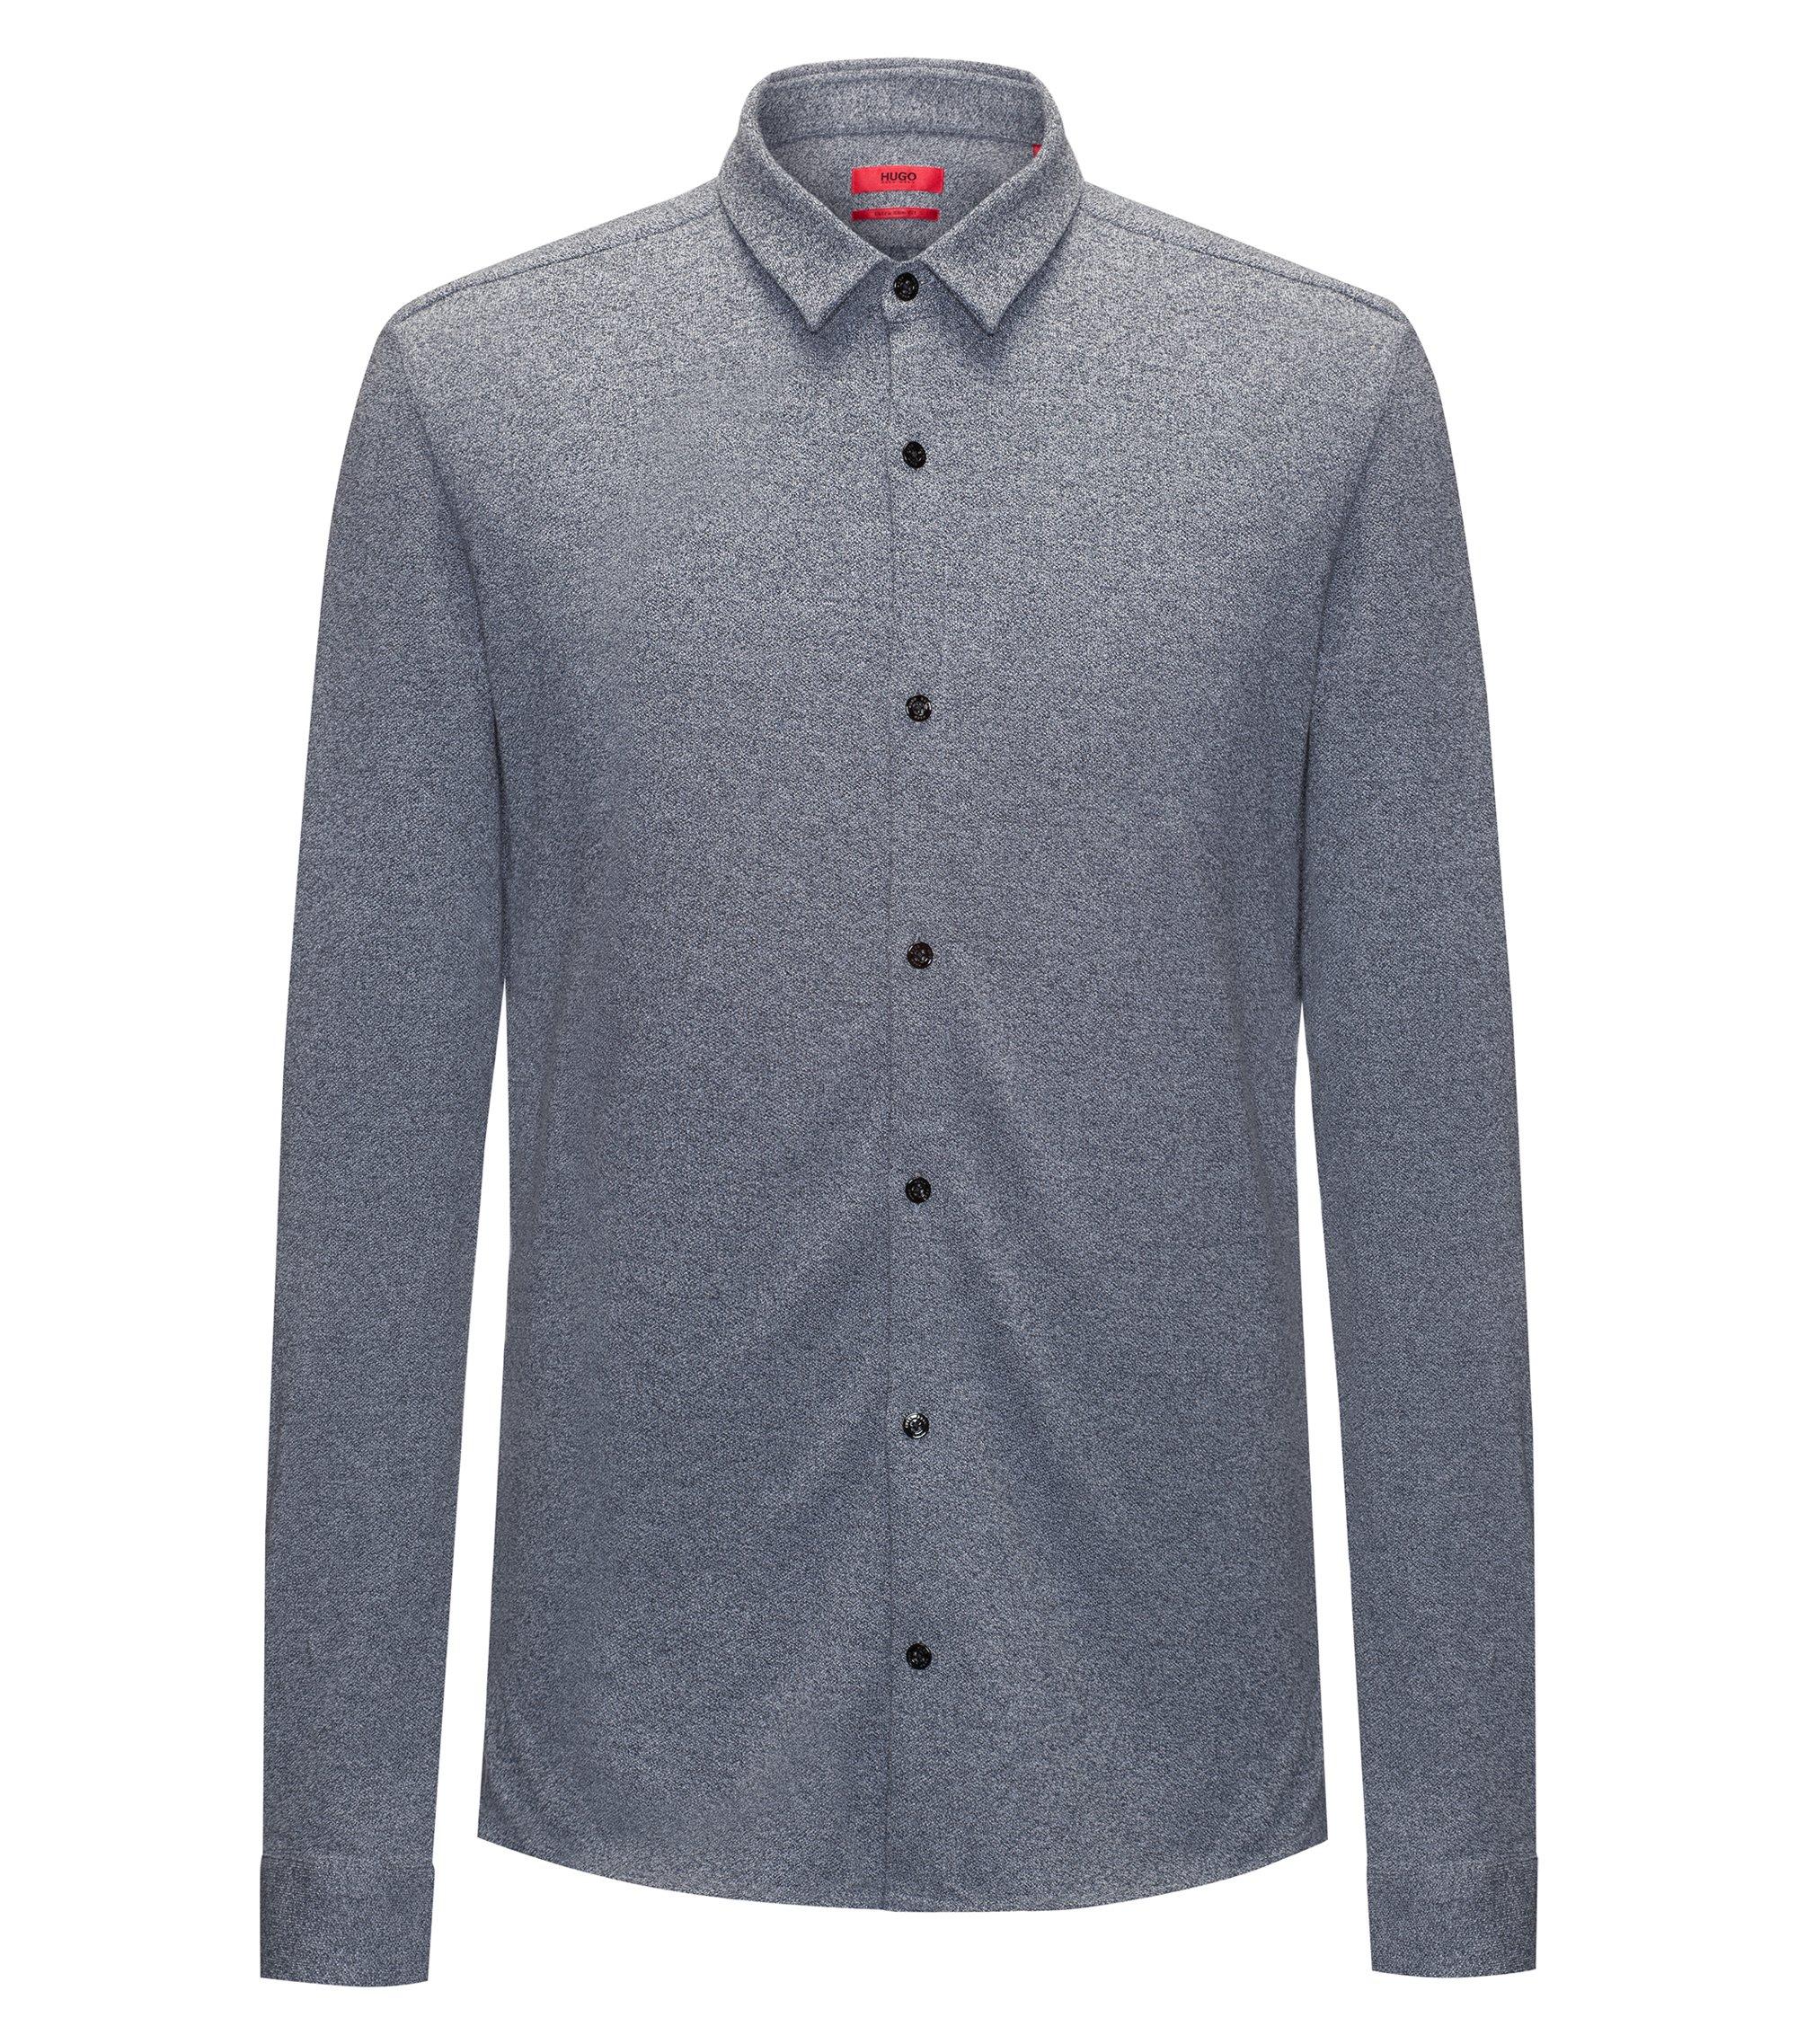 Heathered Cotton Jersery Sport Shirt, , Dark Blue